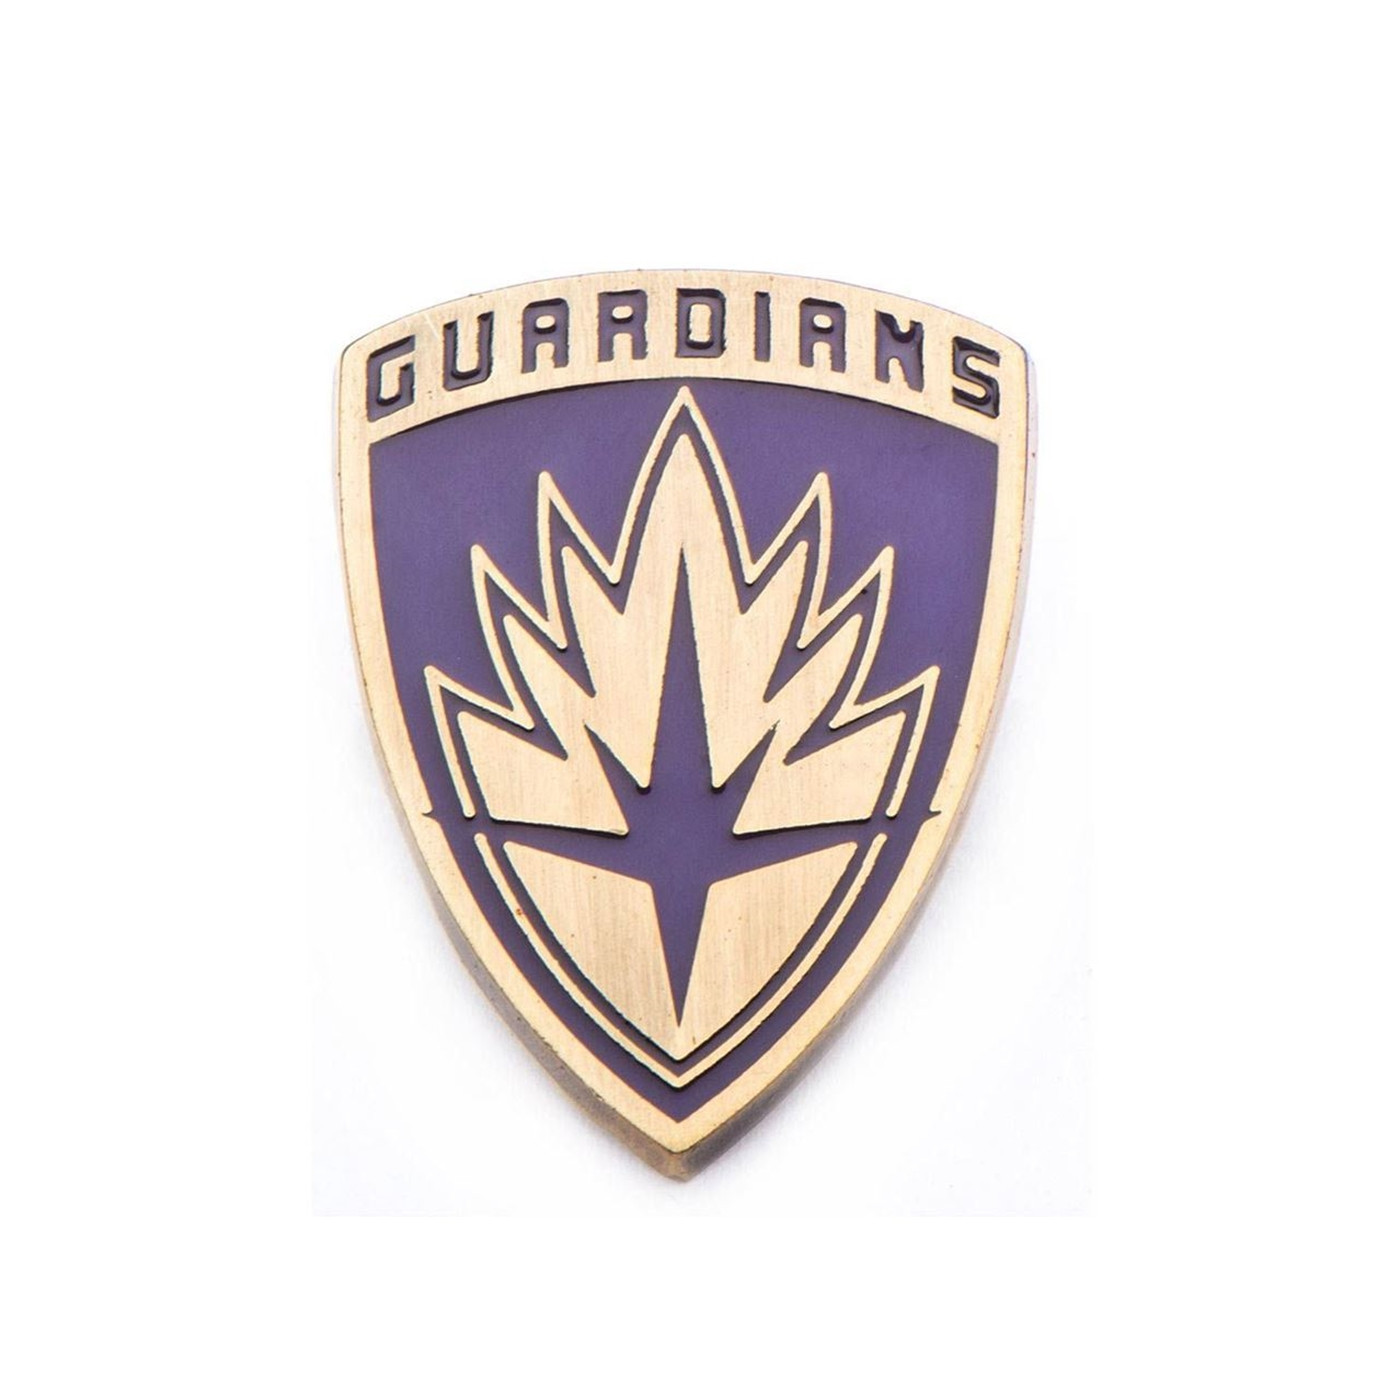 Marvel Base Metal Guardians of the Galaxy Shield Pin